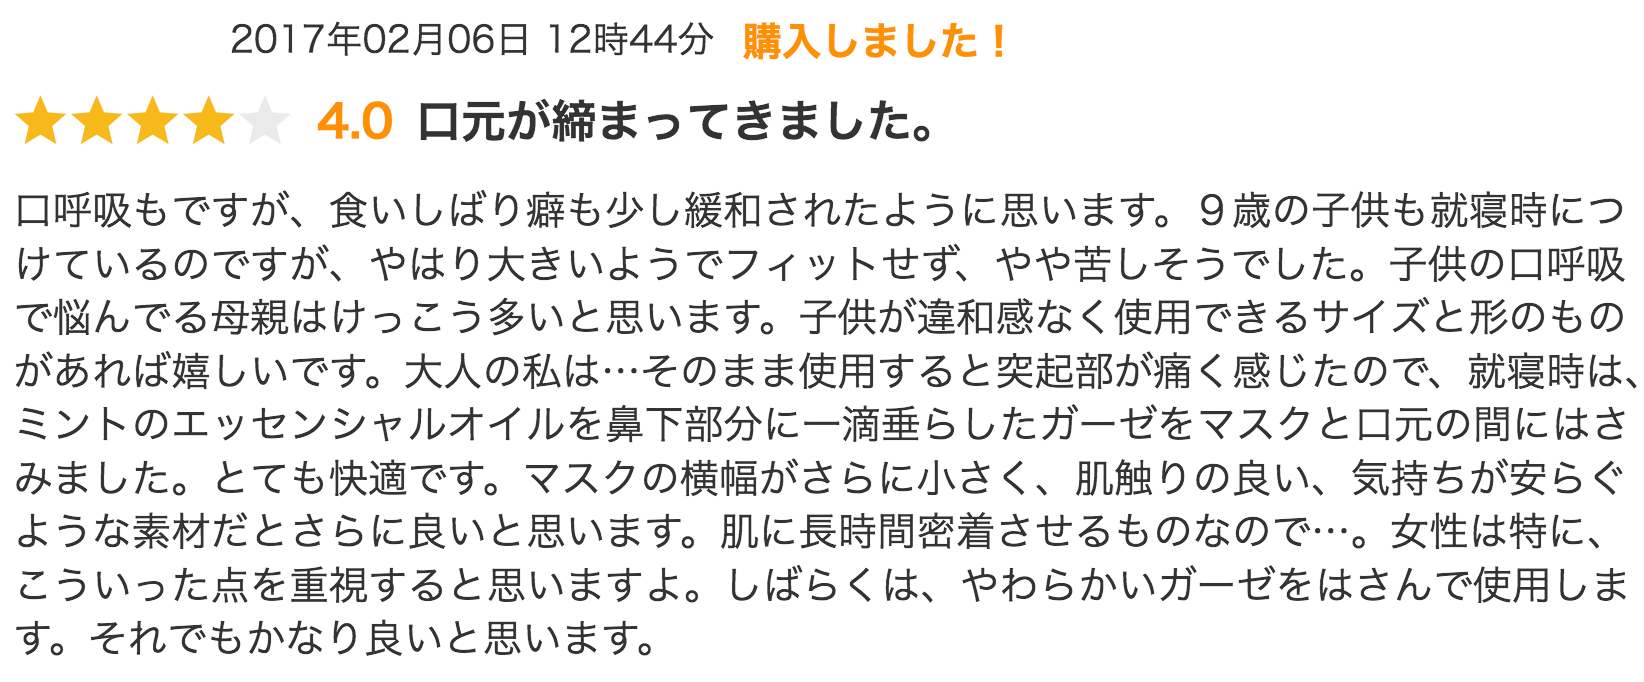 Yahoo!プラス評価のレビュー+4